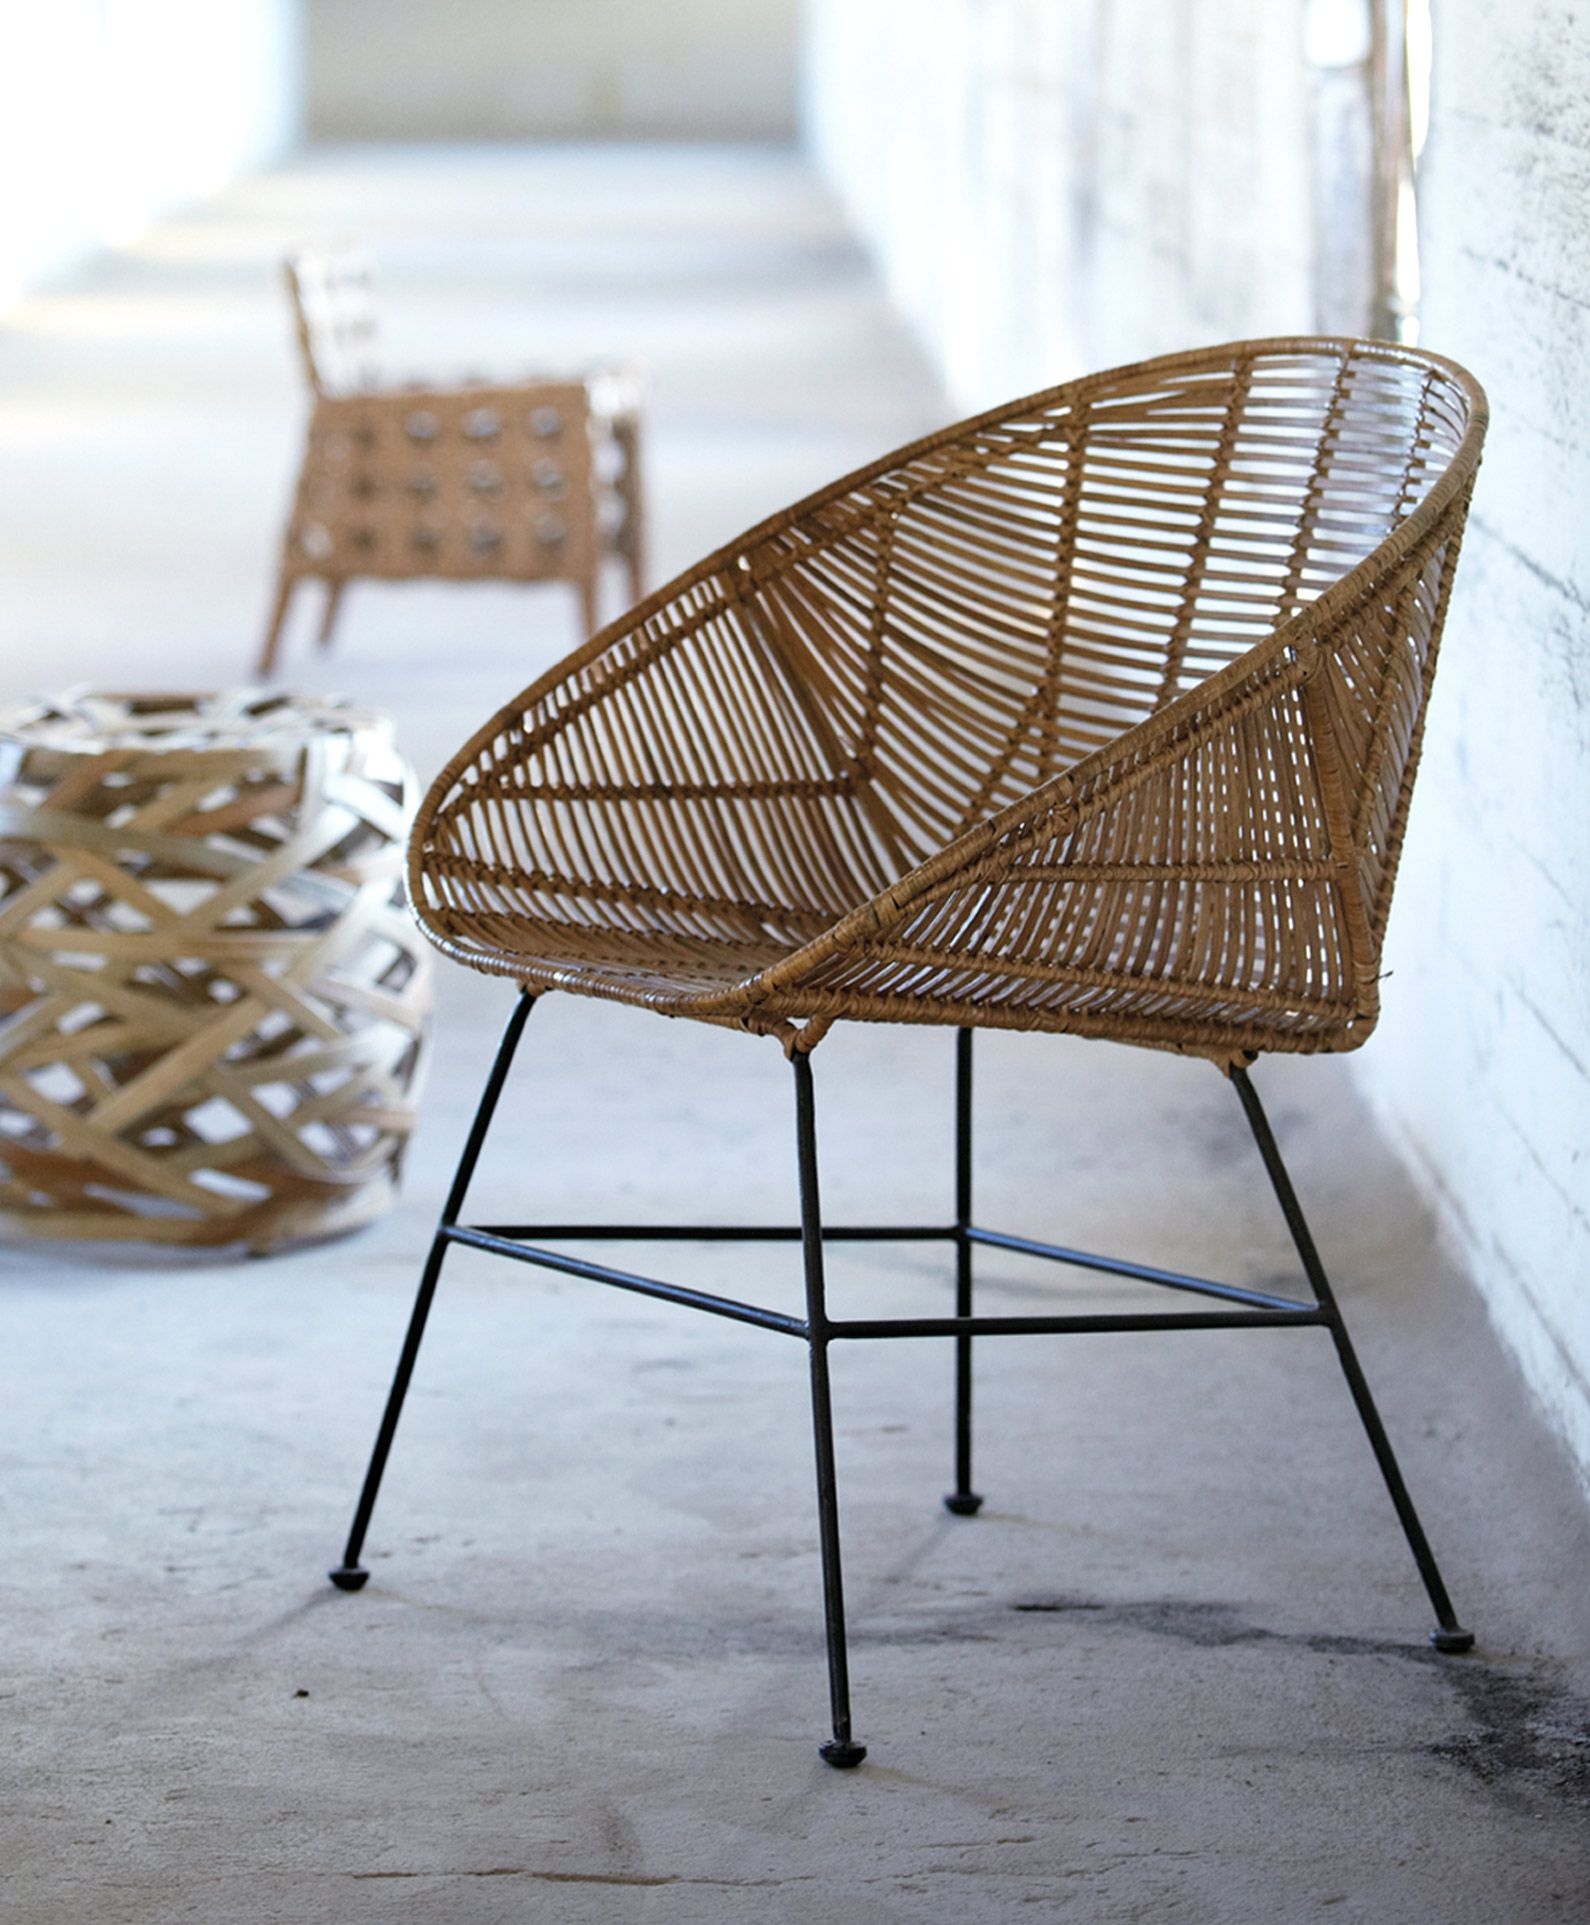 Furniture | Furnitures and accessories | Pinterest | Möbel